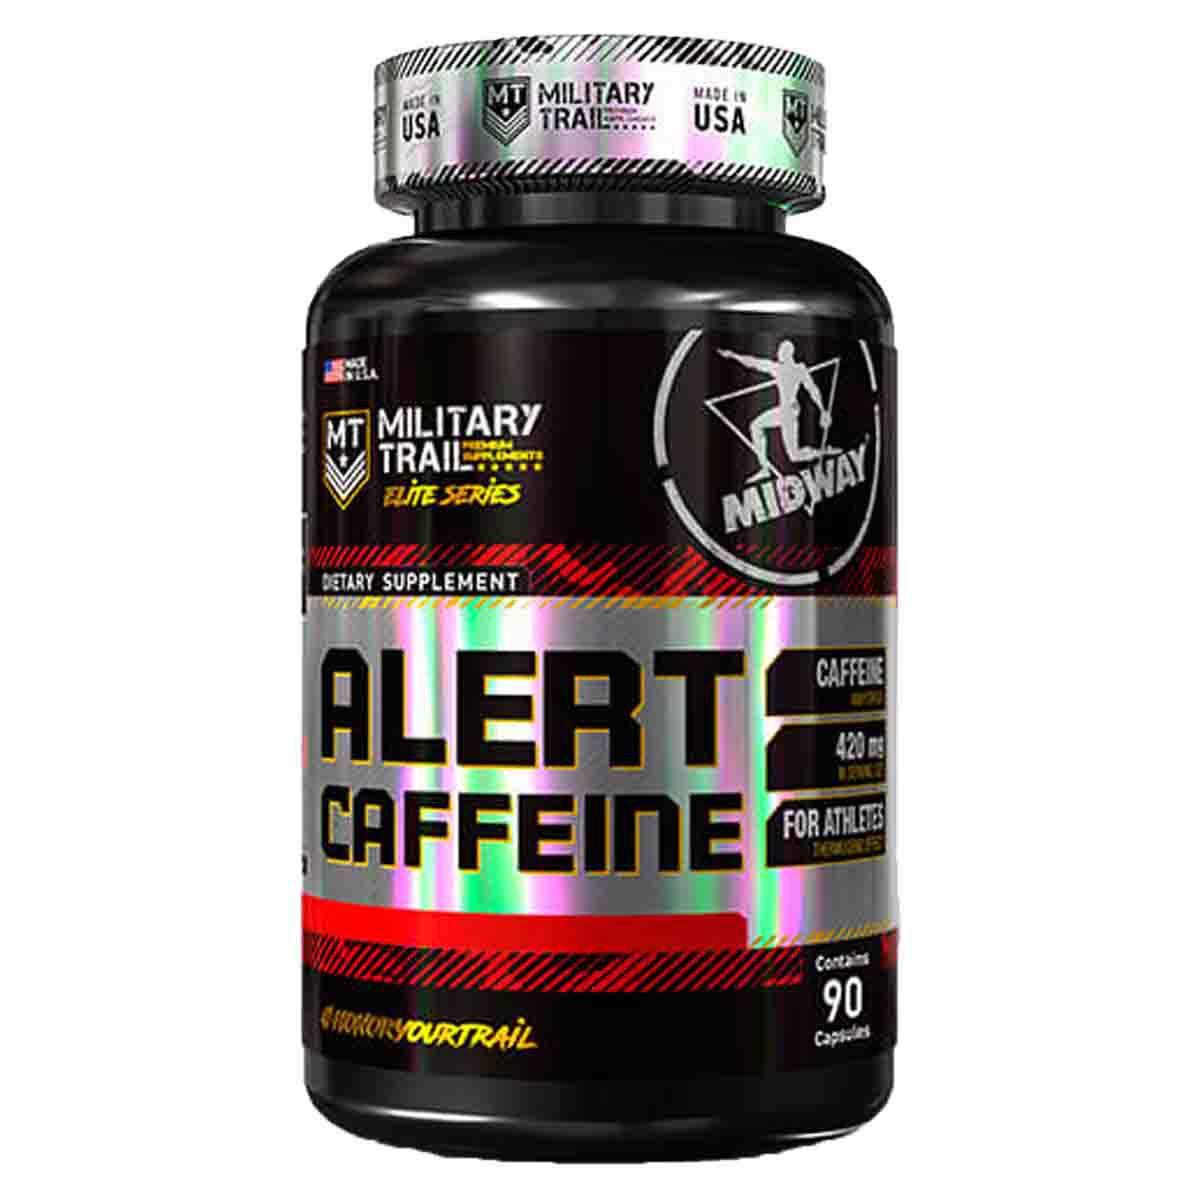 Alert Caffeine 420mg 90 cápsulas - Midway